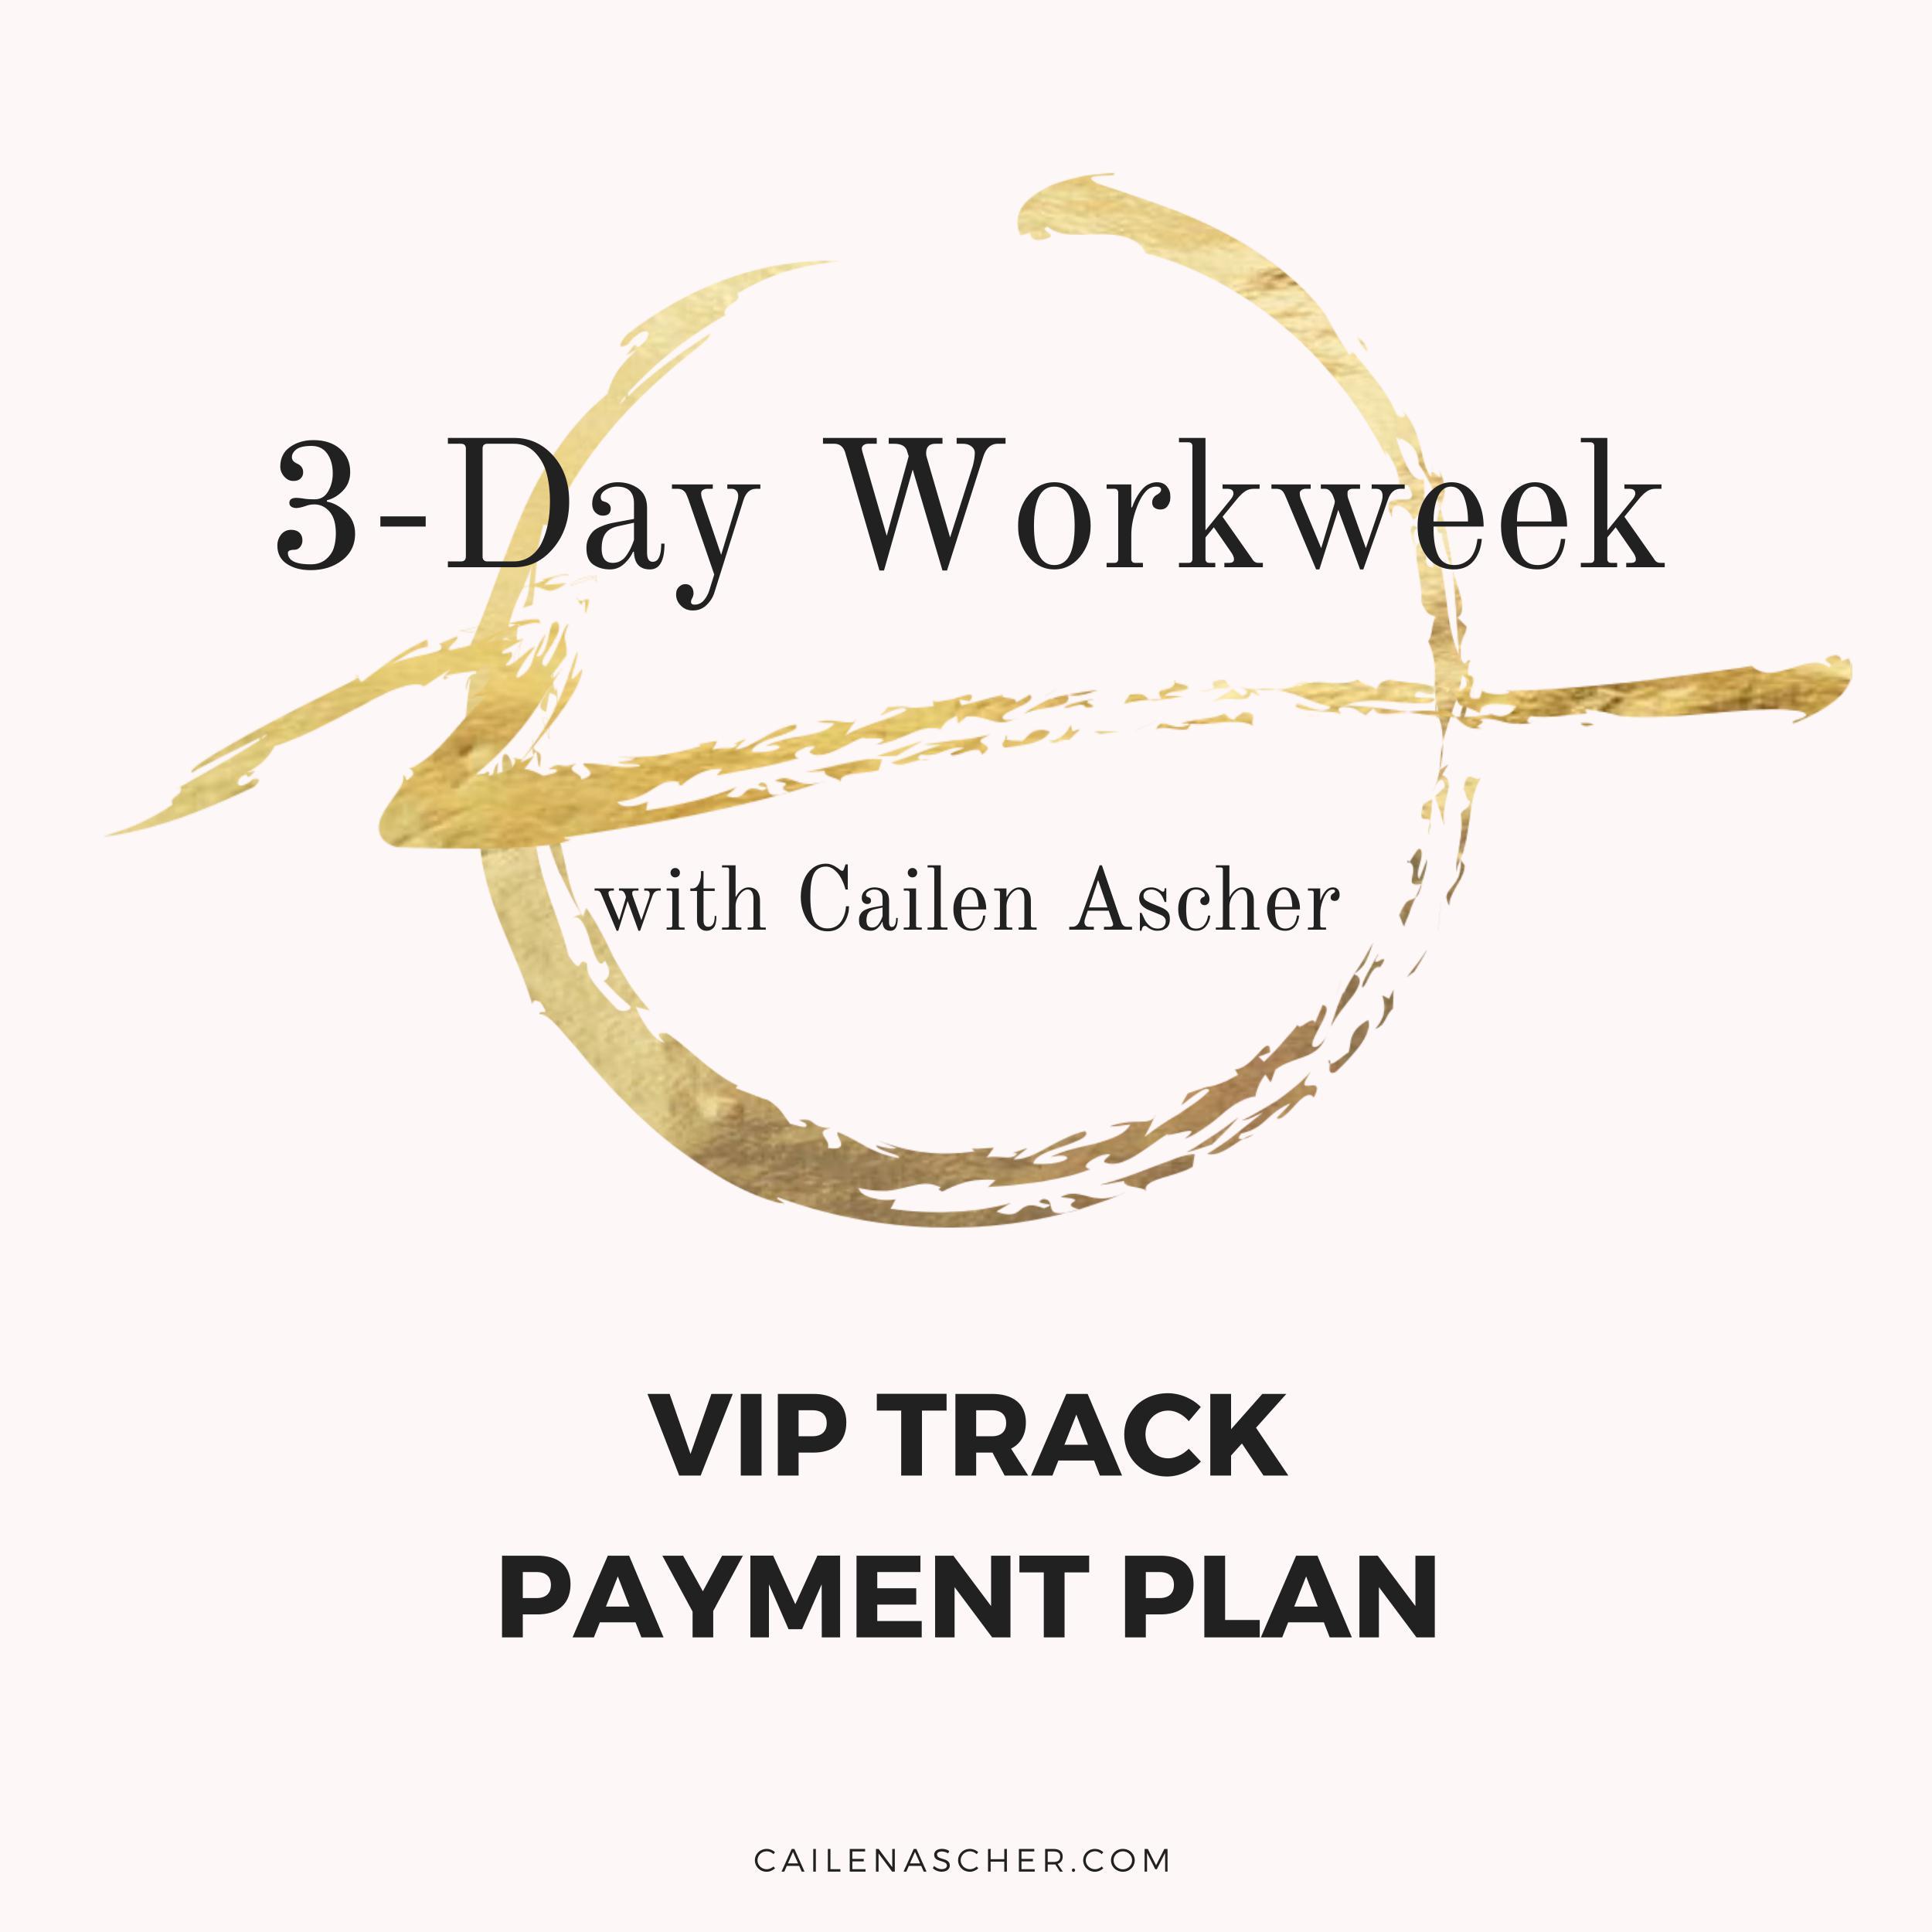 Cailen Ascher - 3-Day Workweek Program - Payment Plan Option Image - VIP Track Payment Plan.jpg